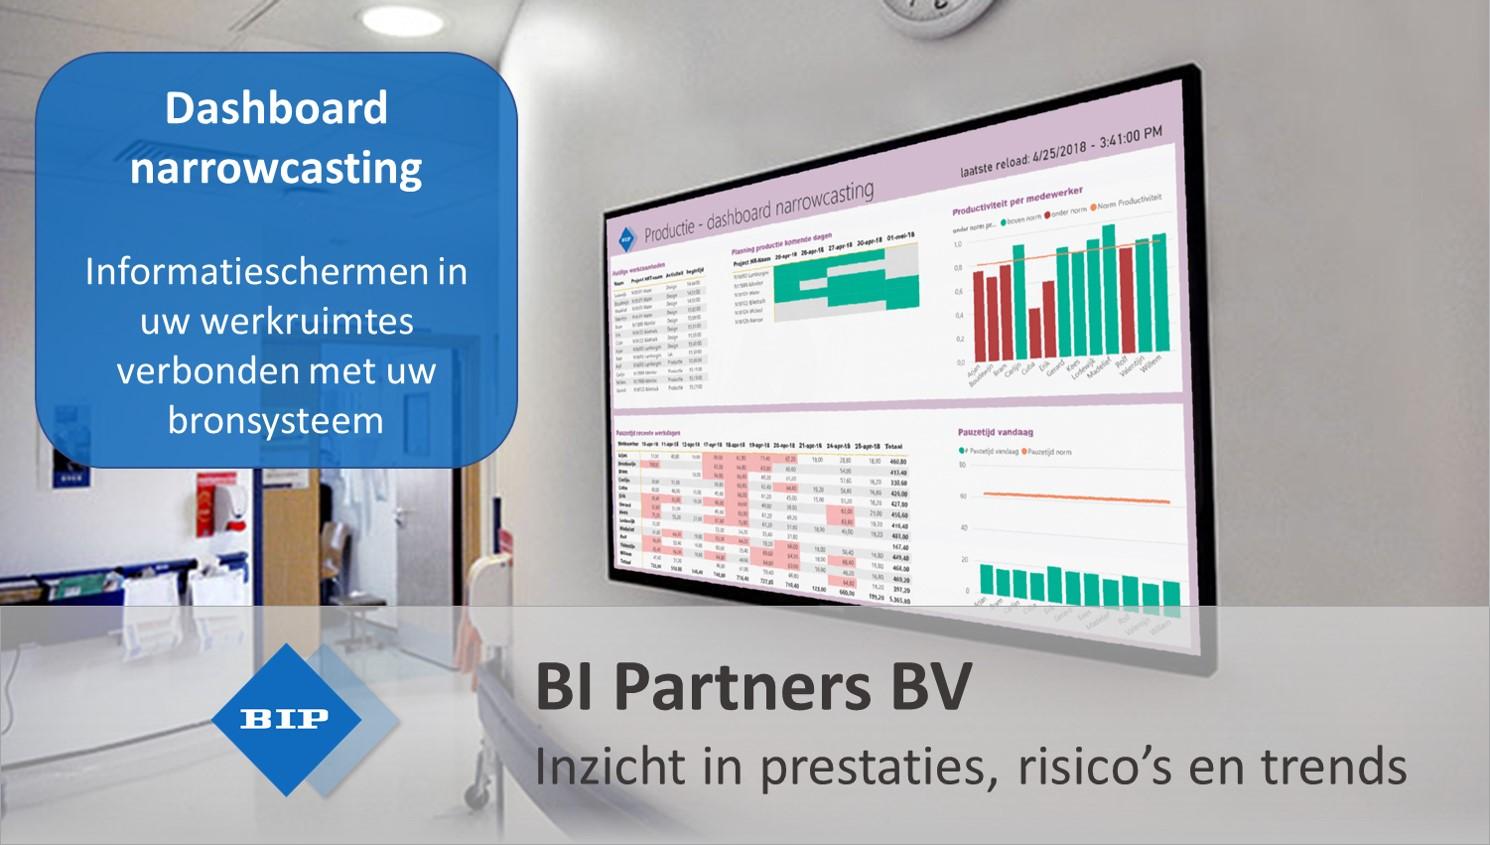 BI Partners introduceert Dashboard Narrowcasting